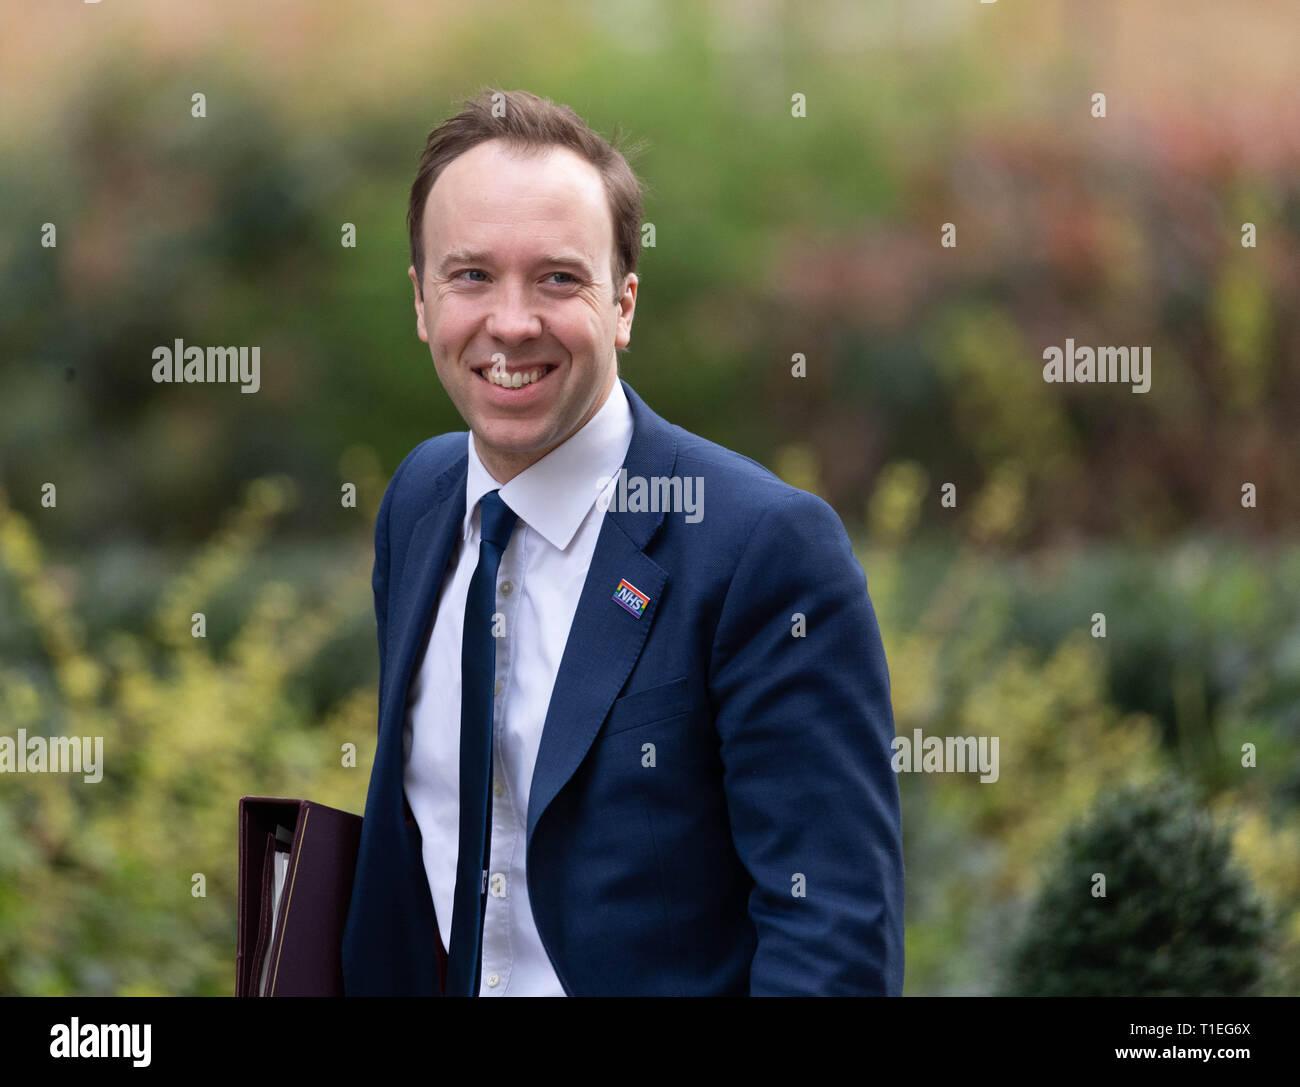 London, UK. 26th March 2019, Matt Hancock, MP PC, Health Secretary arrives at a Cabinet meeting at 10 Downing Street, London, UK. Credit: Ian Davidson/Alamy Live News - Stock Image